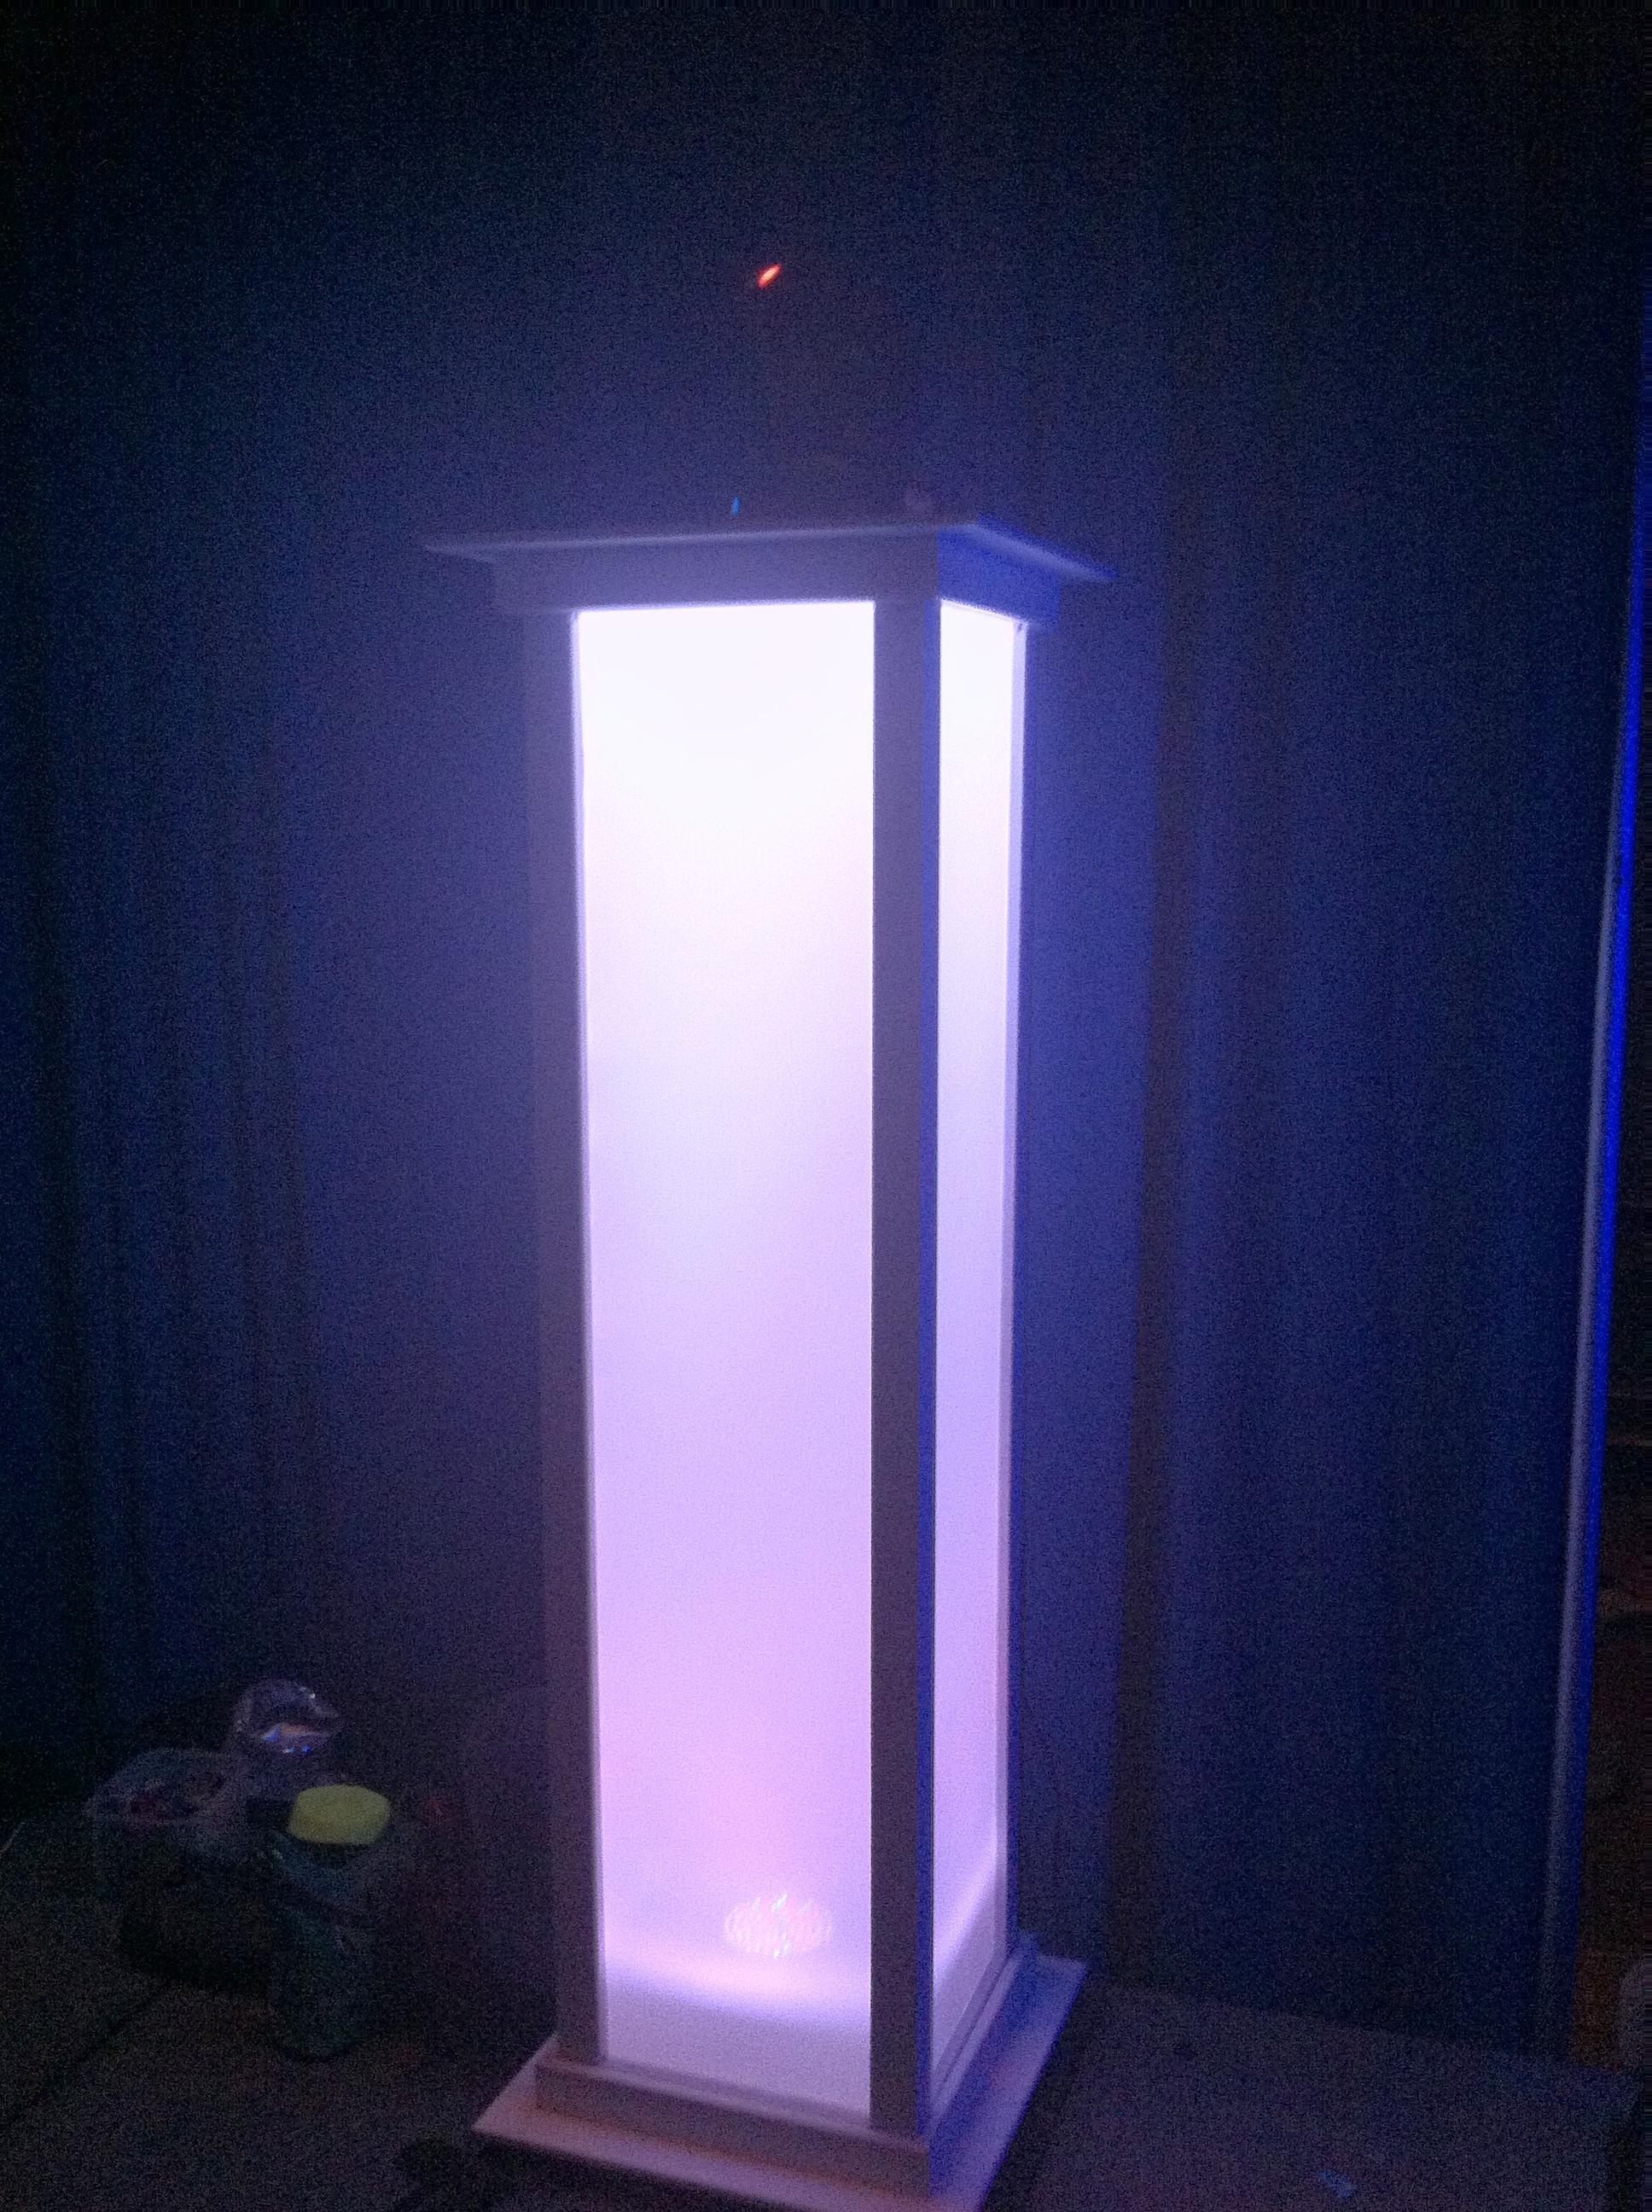 dj light stand.jpg